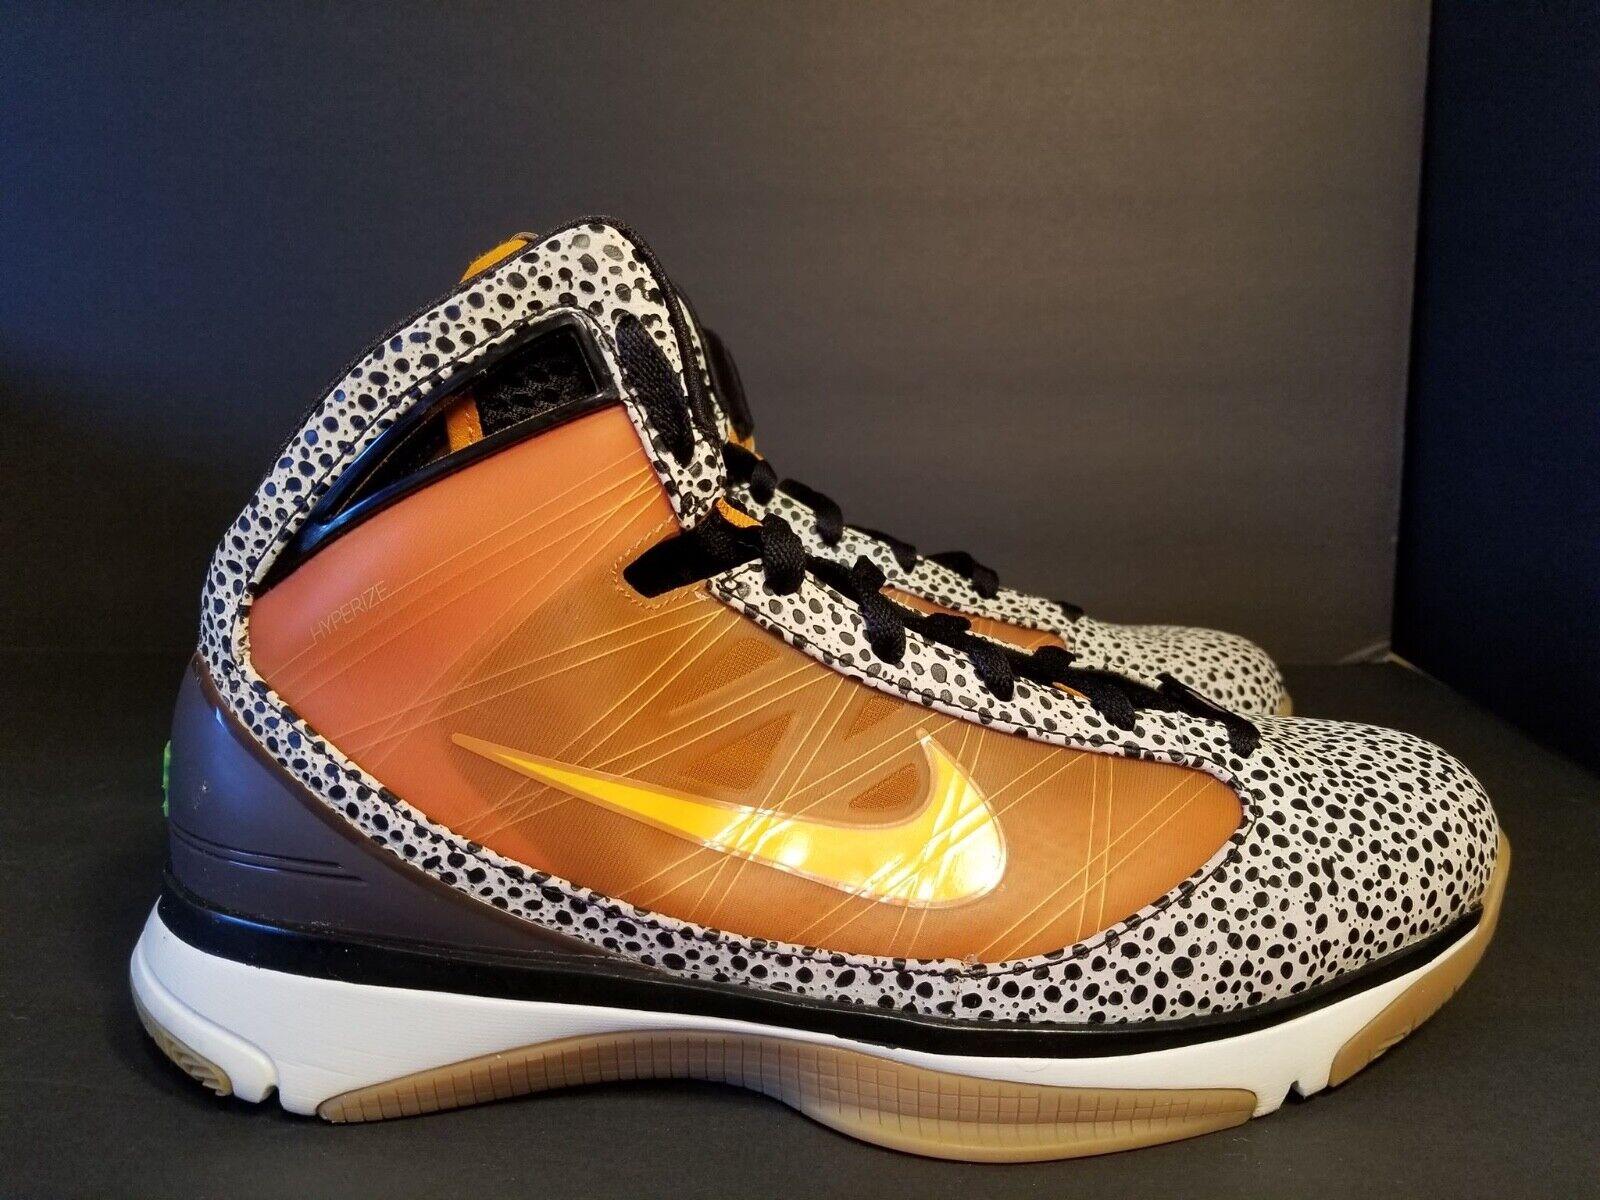 5f37d4210d11e SUPREME RARE SIZE 10.5 NIKE HYPERIZE zefjjq6125-Athletic Shoes ...